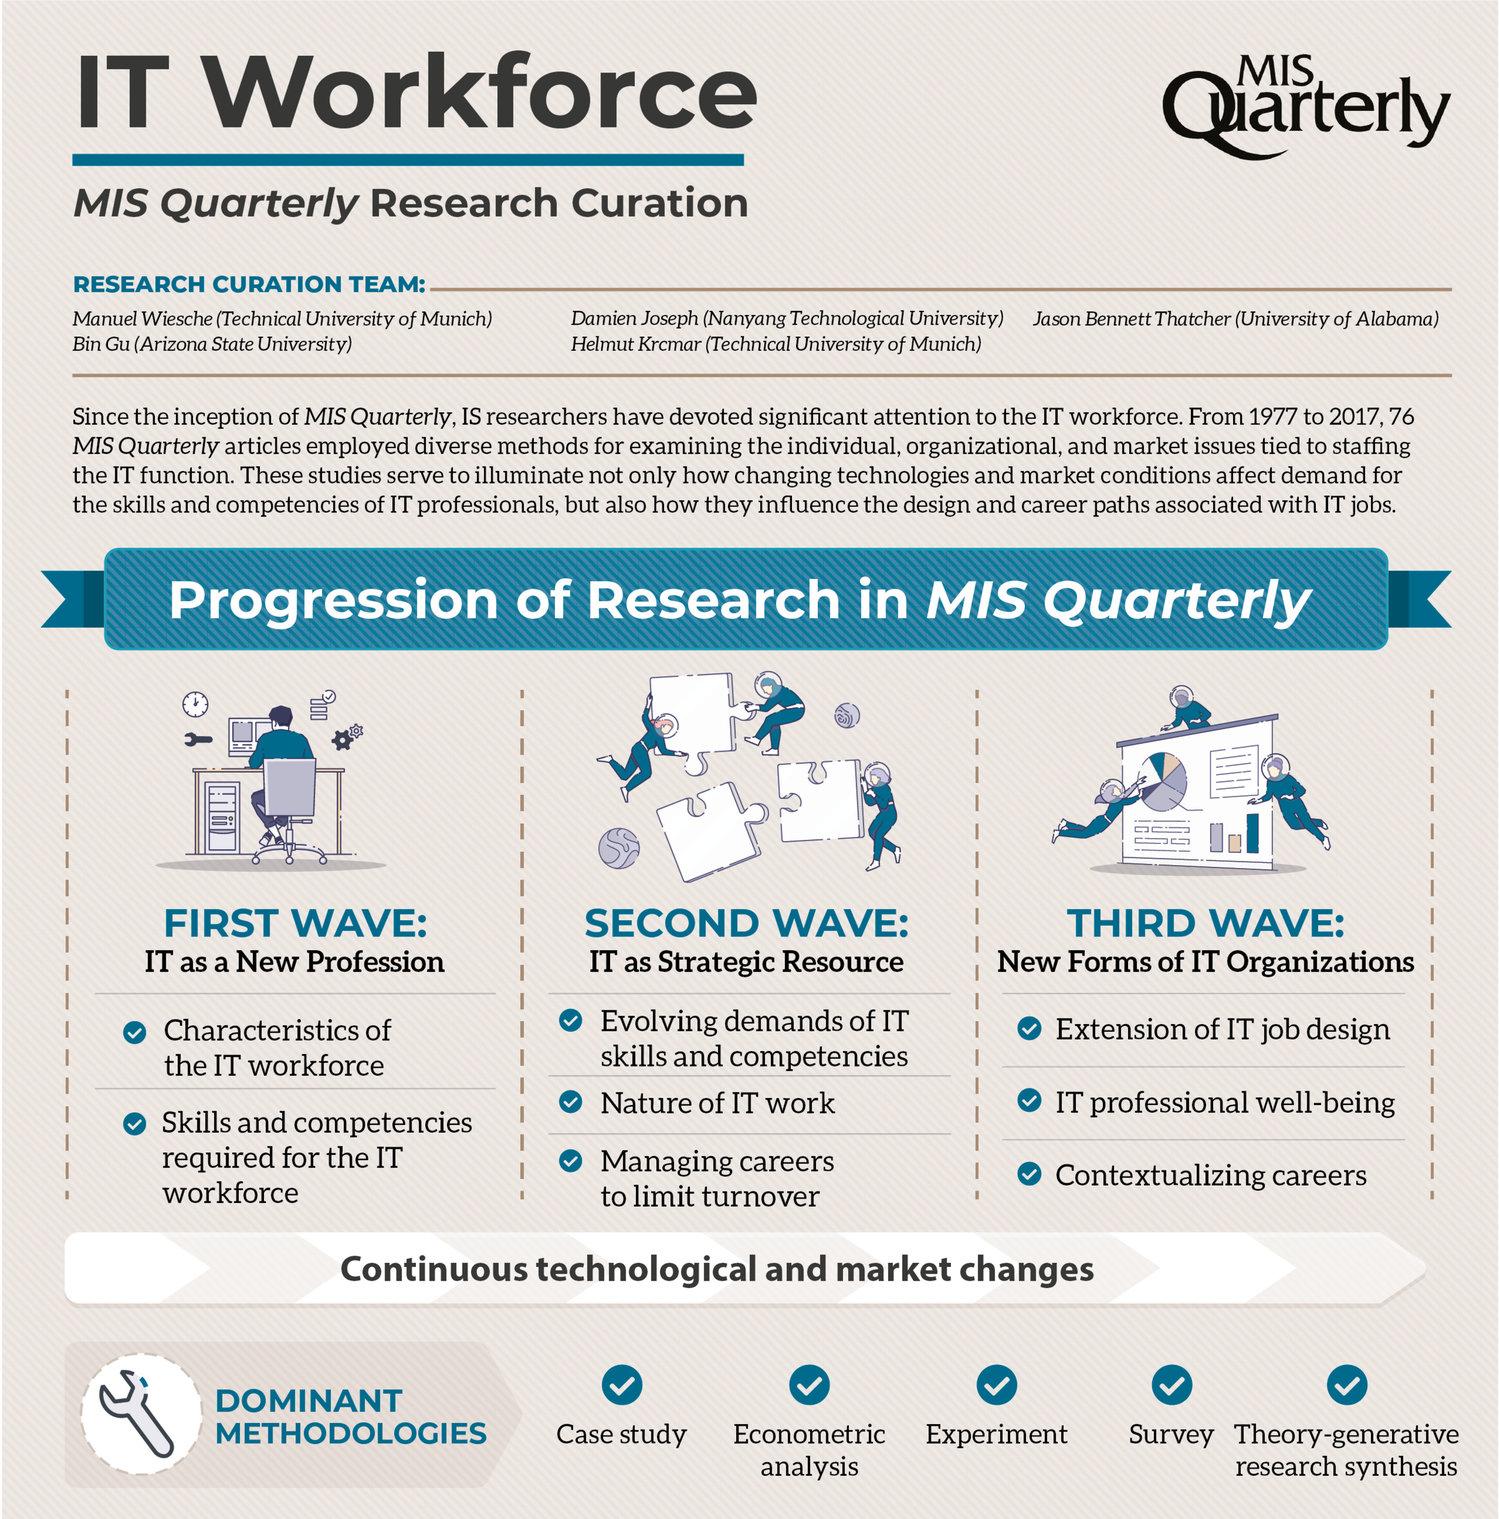 IT Workforce — MIS Quarterly